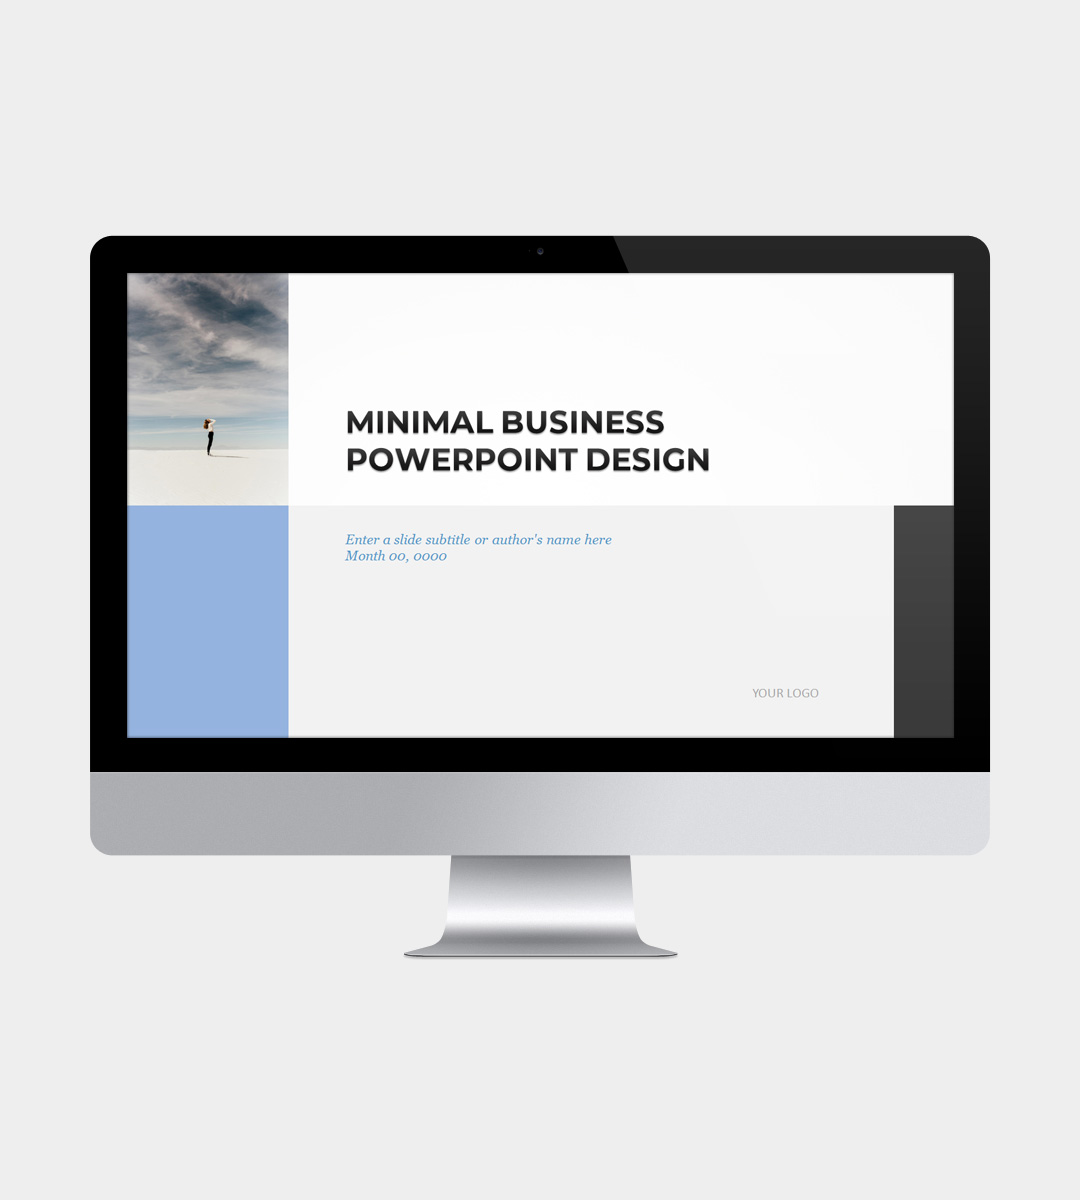 Minimalist Powerpoint Template: Minimal Business Plan PowerPoint Template